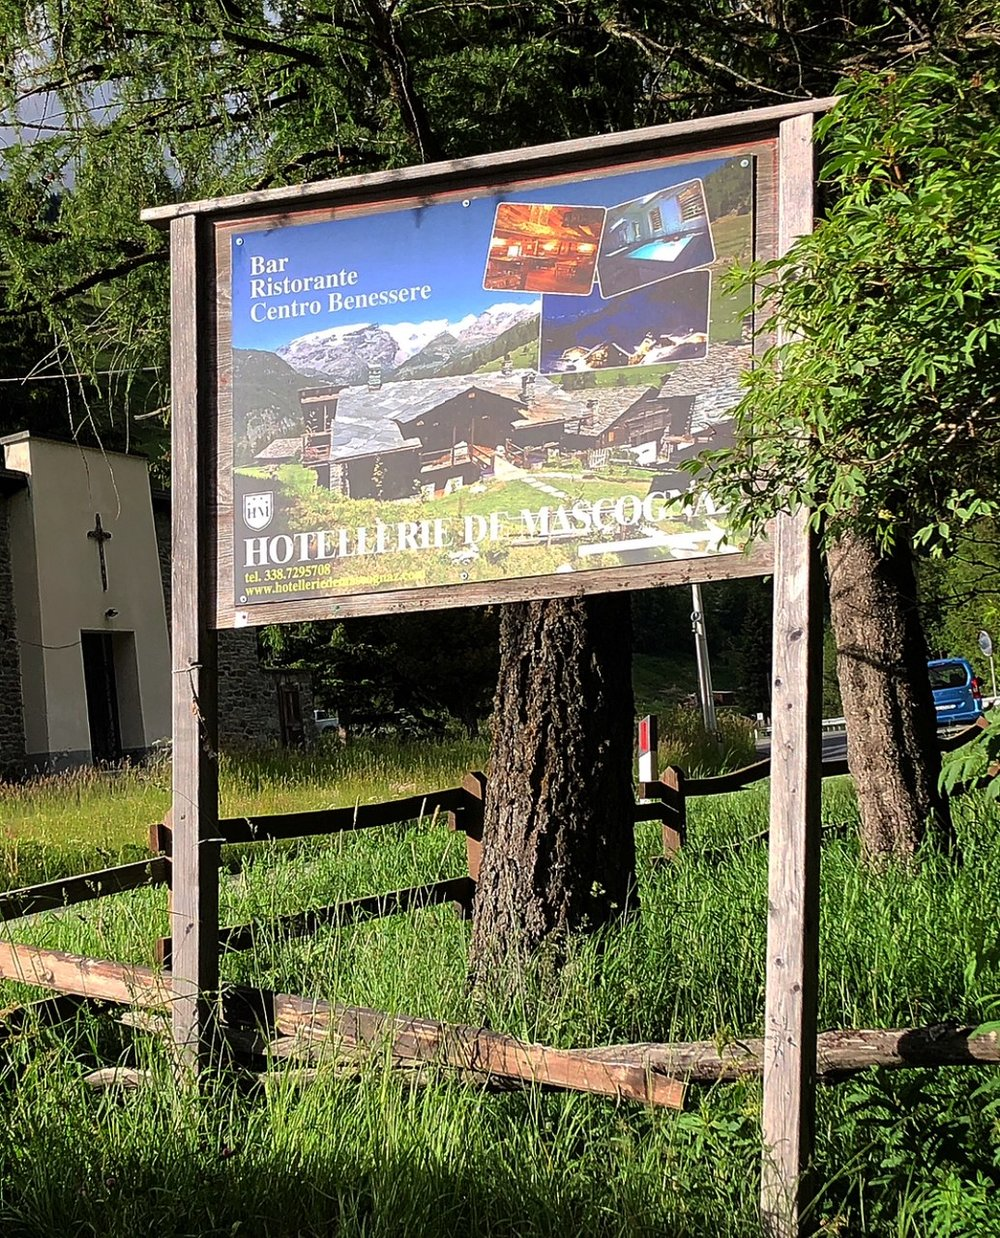 Mascognaz-valle-d-aosta